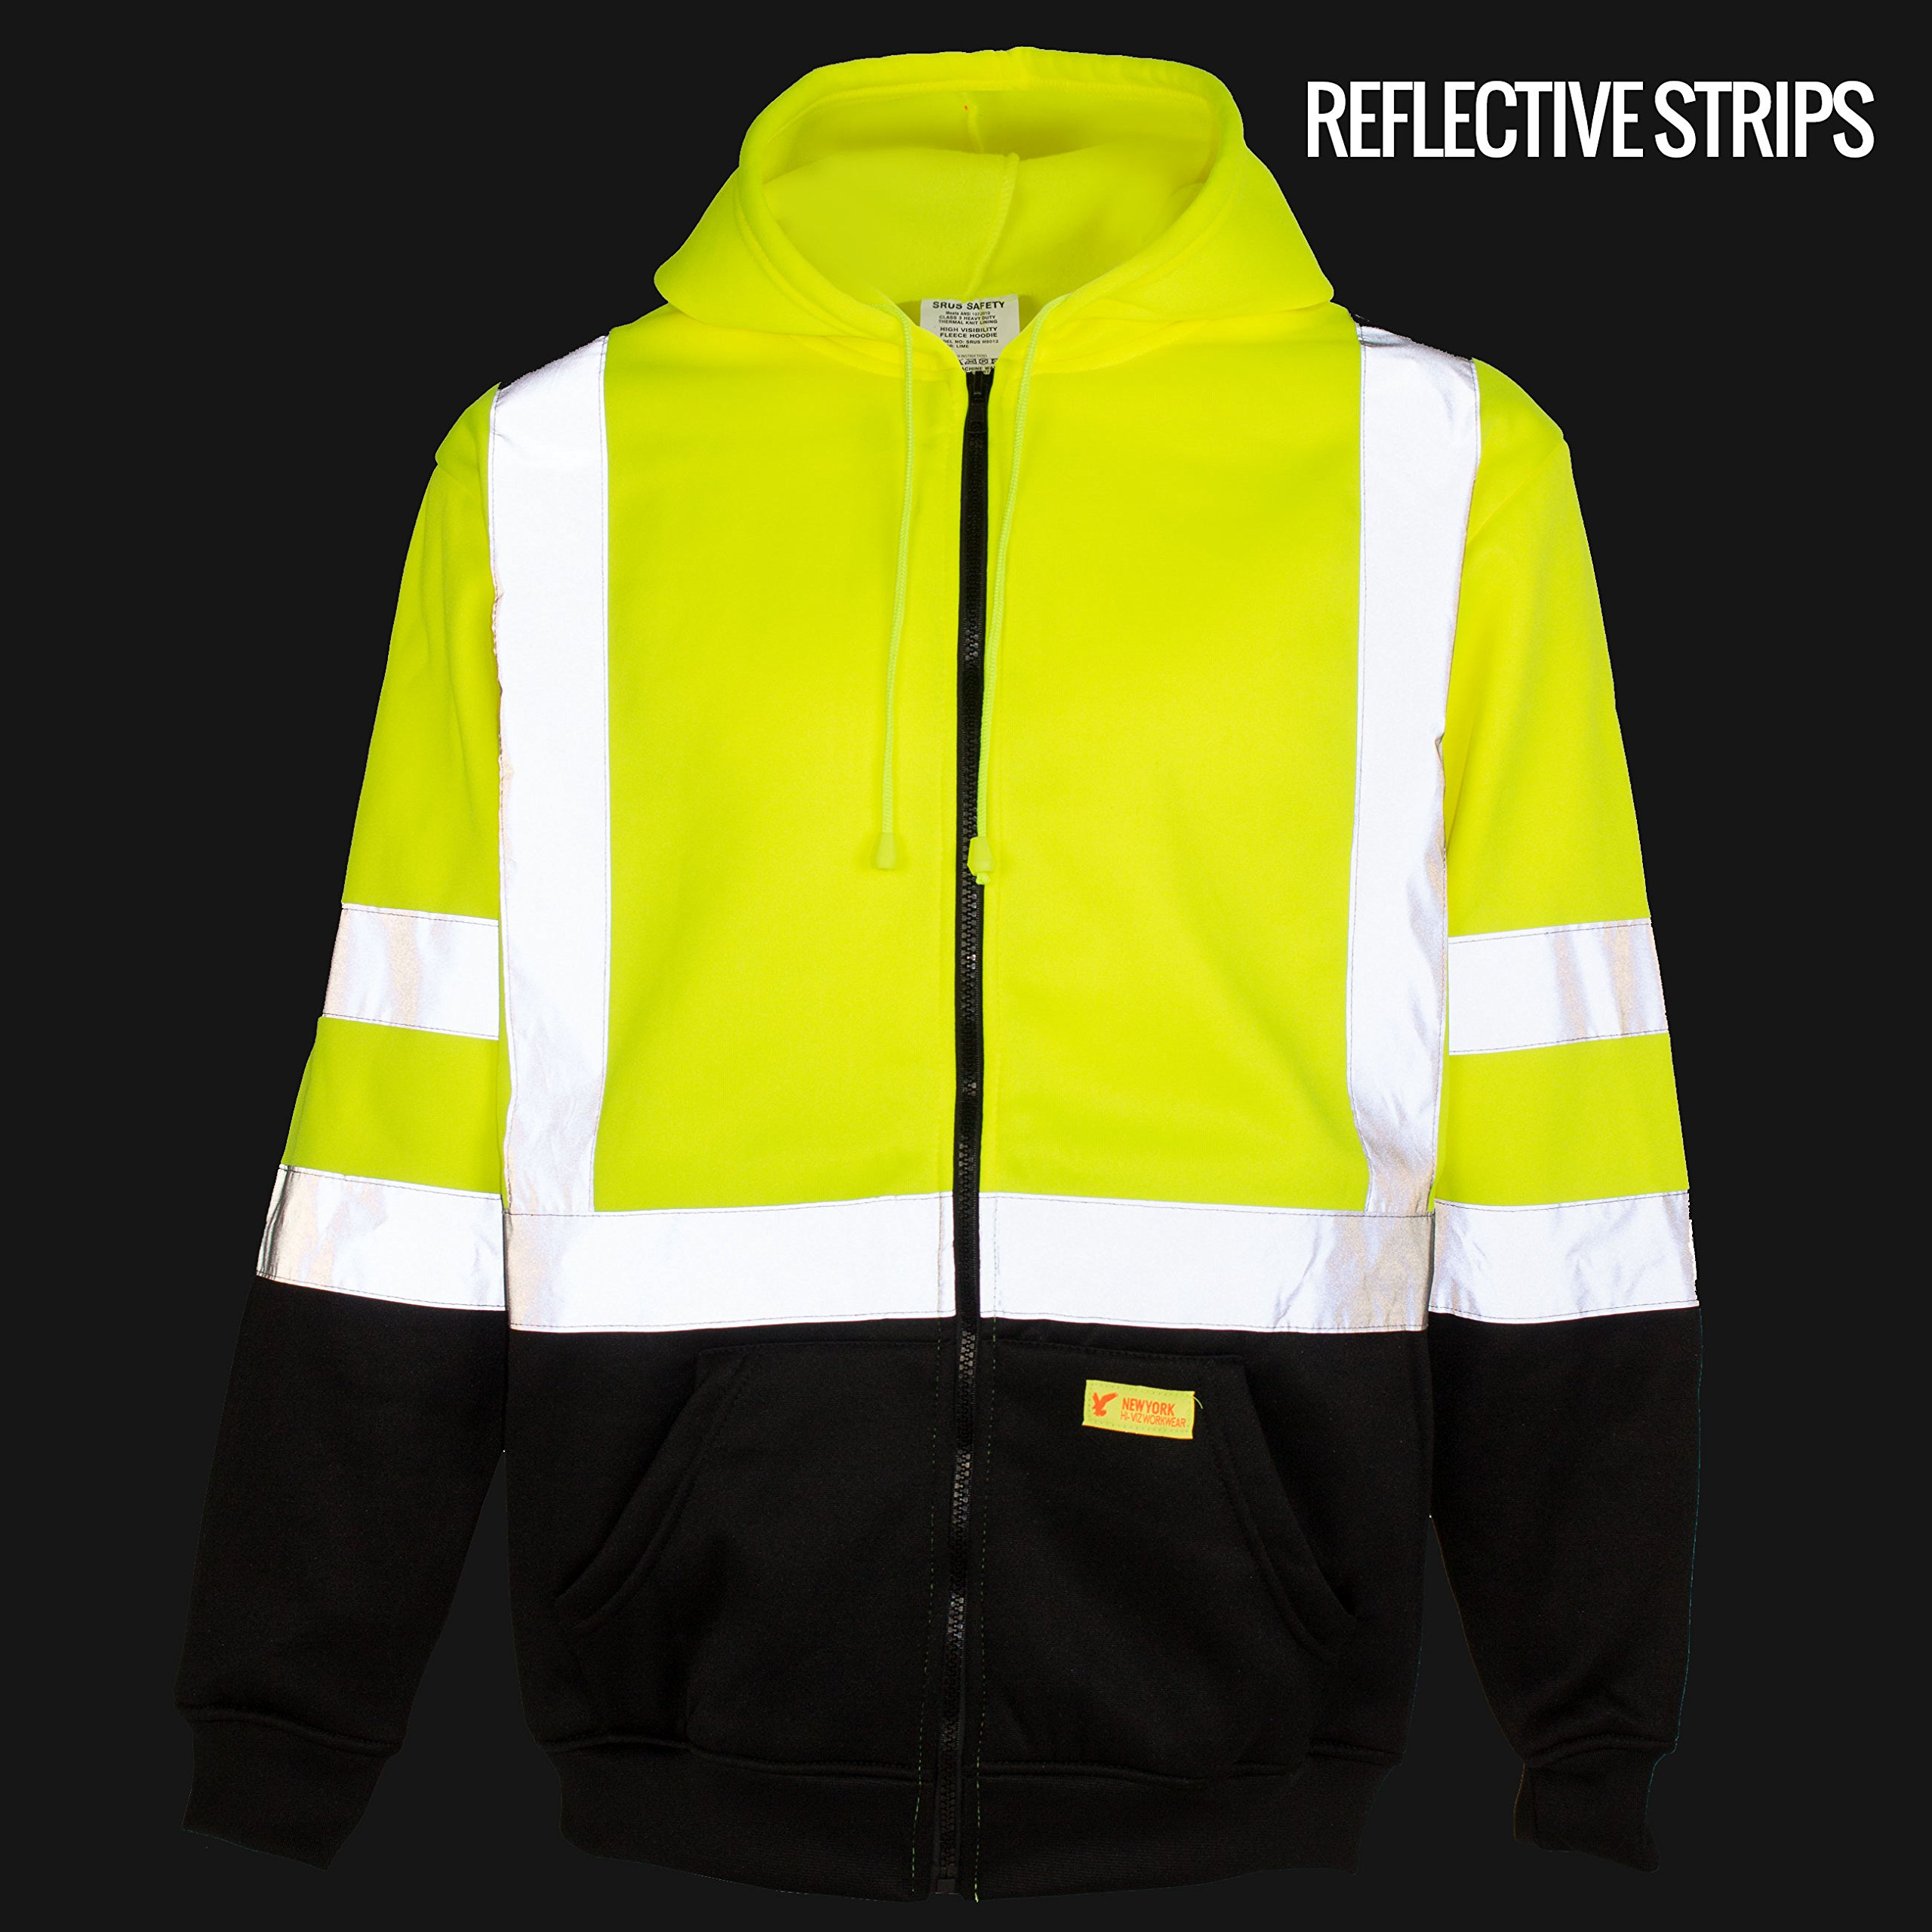 New York Hi-Viz Workwear H9012 Men's ANSI Class 3 High Visibility Class 3 Sweatshirt, Full Zip Hooded, Lightweight, Black Bottom (XX-Large) by New York Hi-Viz Workwear (Image #4)